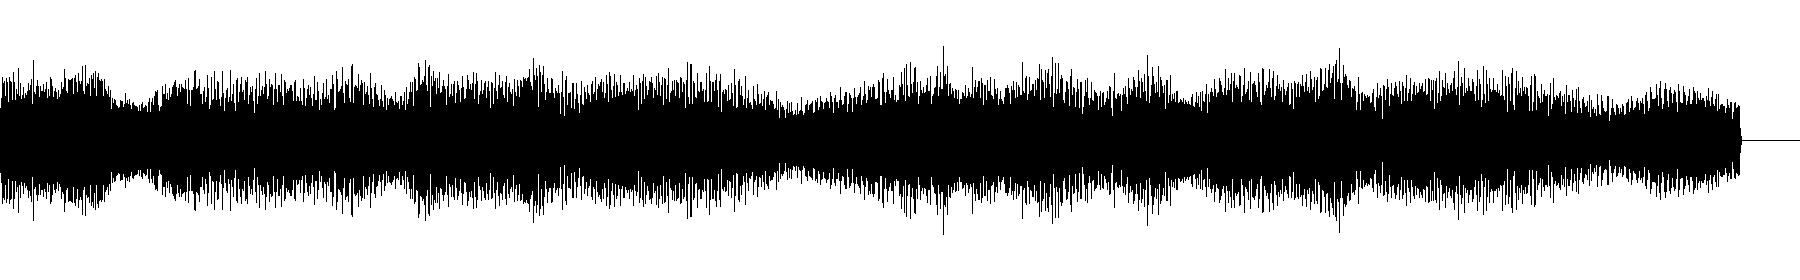 103 e sinswingupchord sp 01